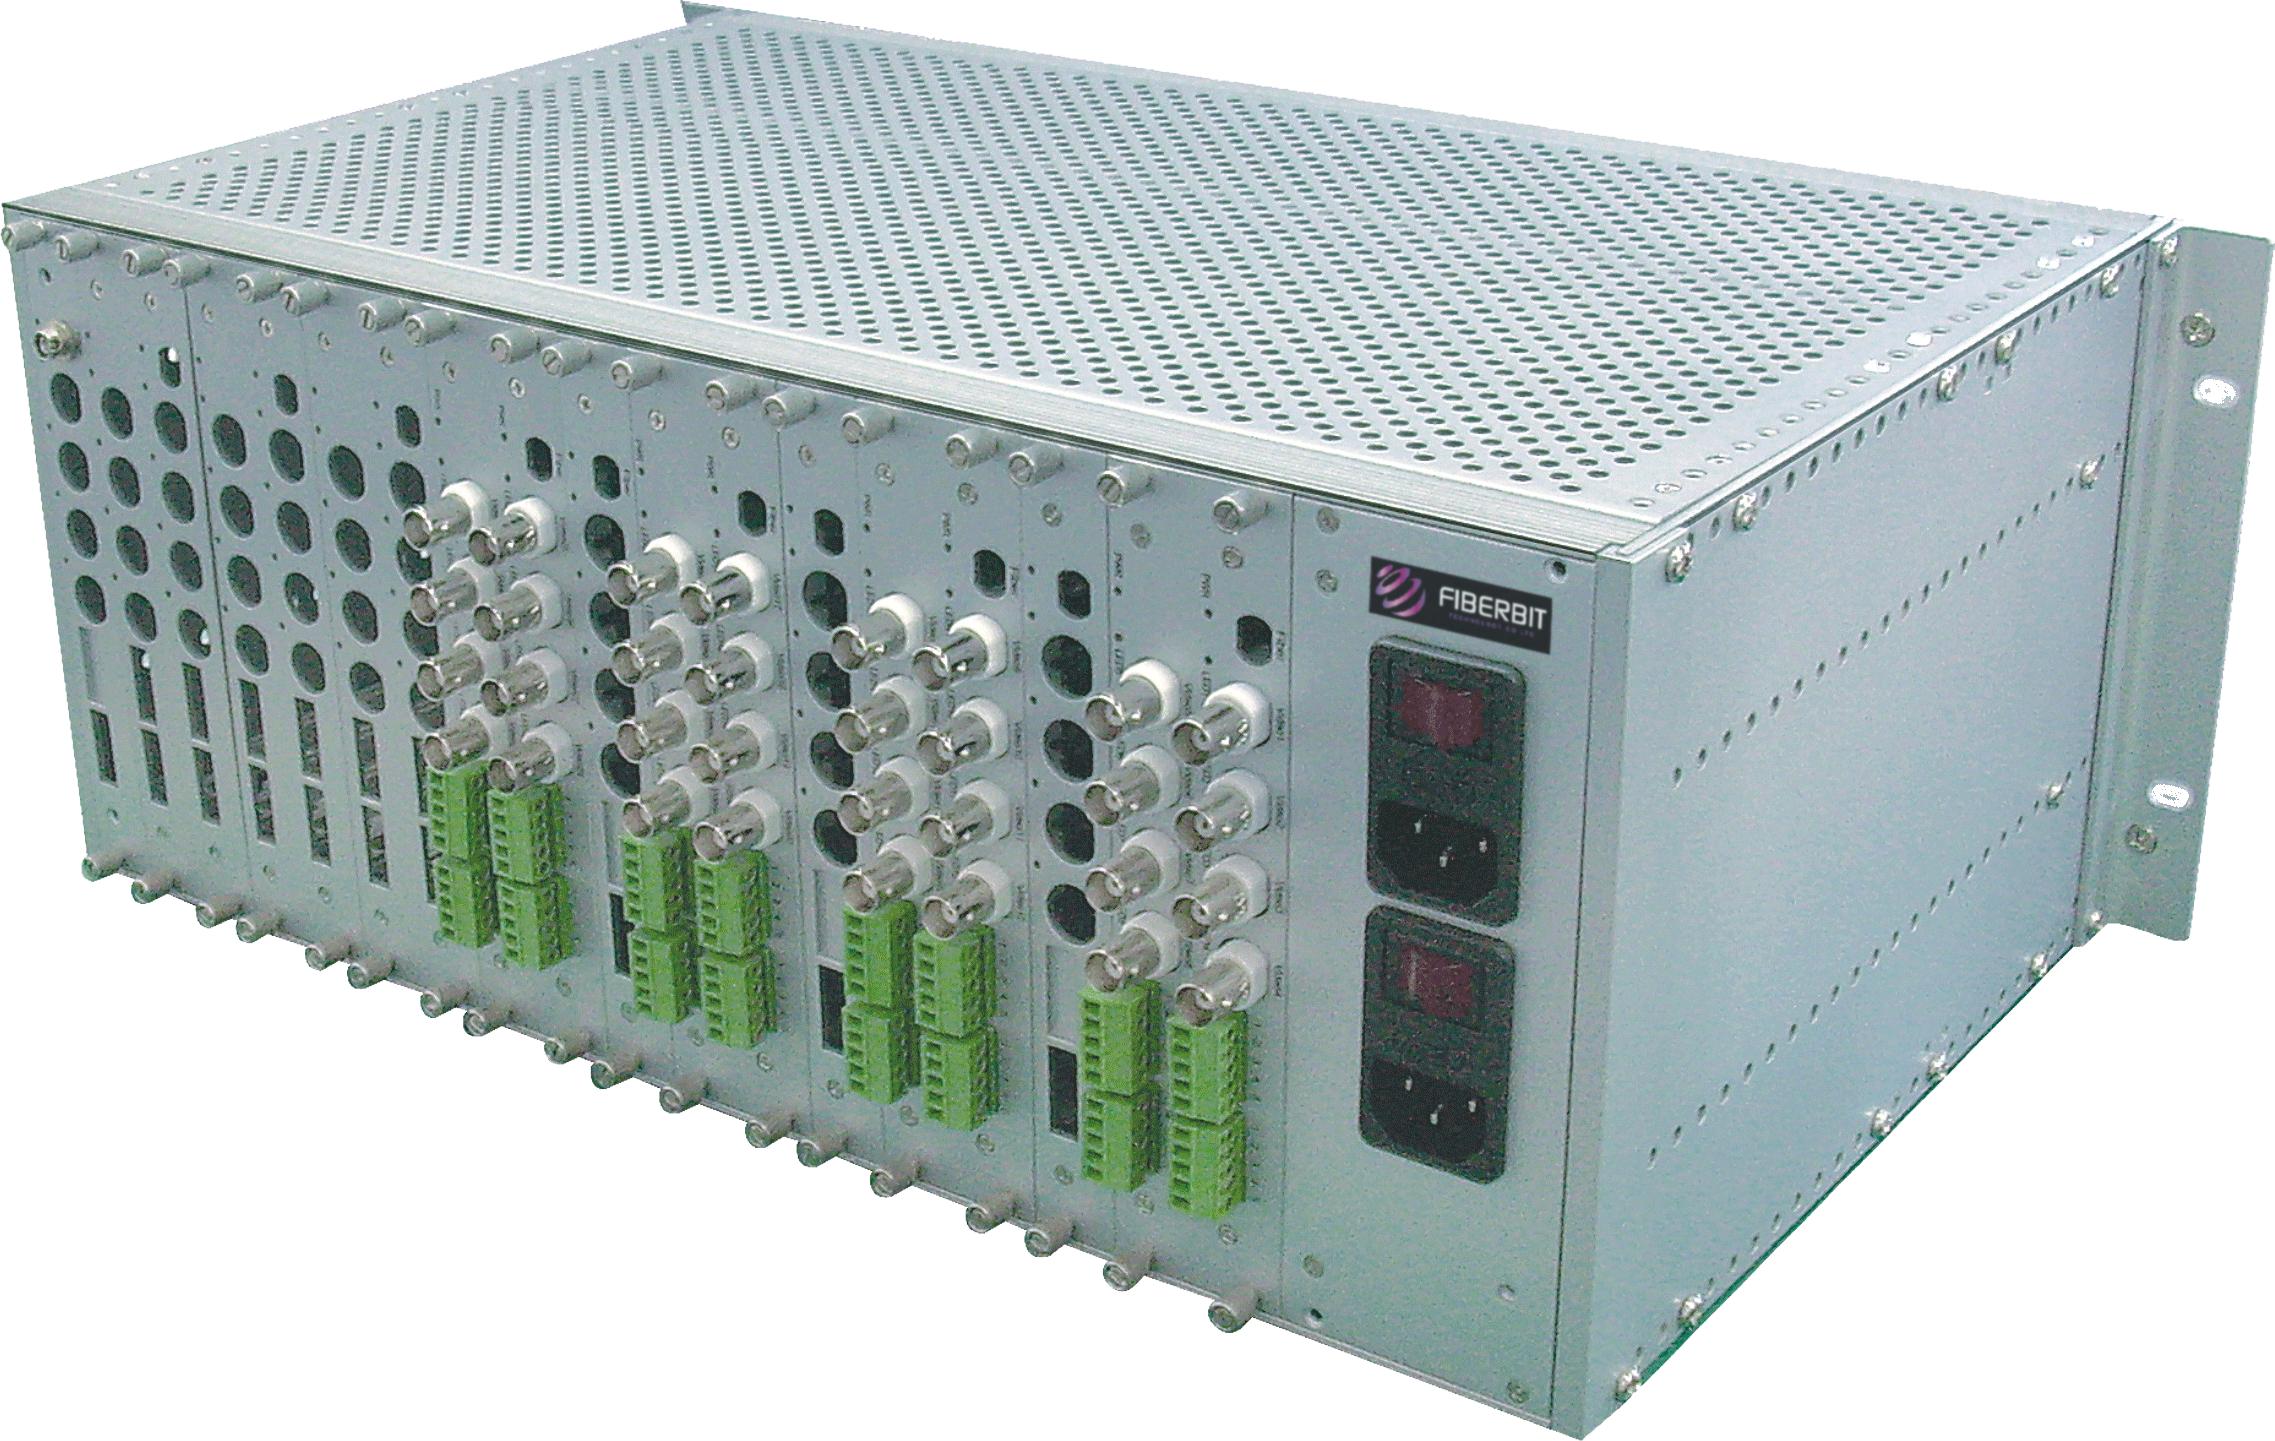 32 Video Ports to Fiber Optic Converter